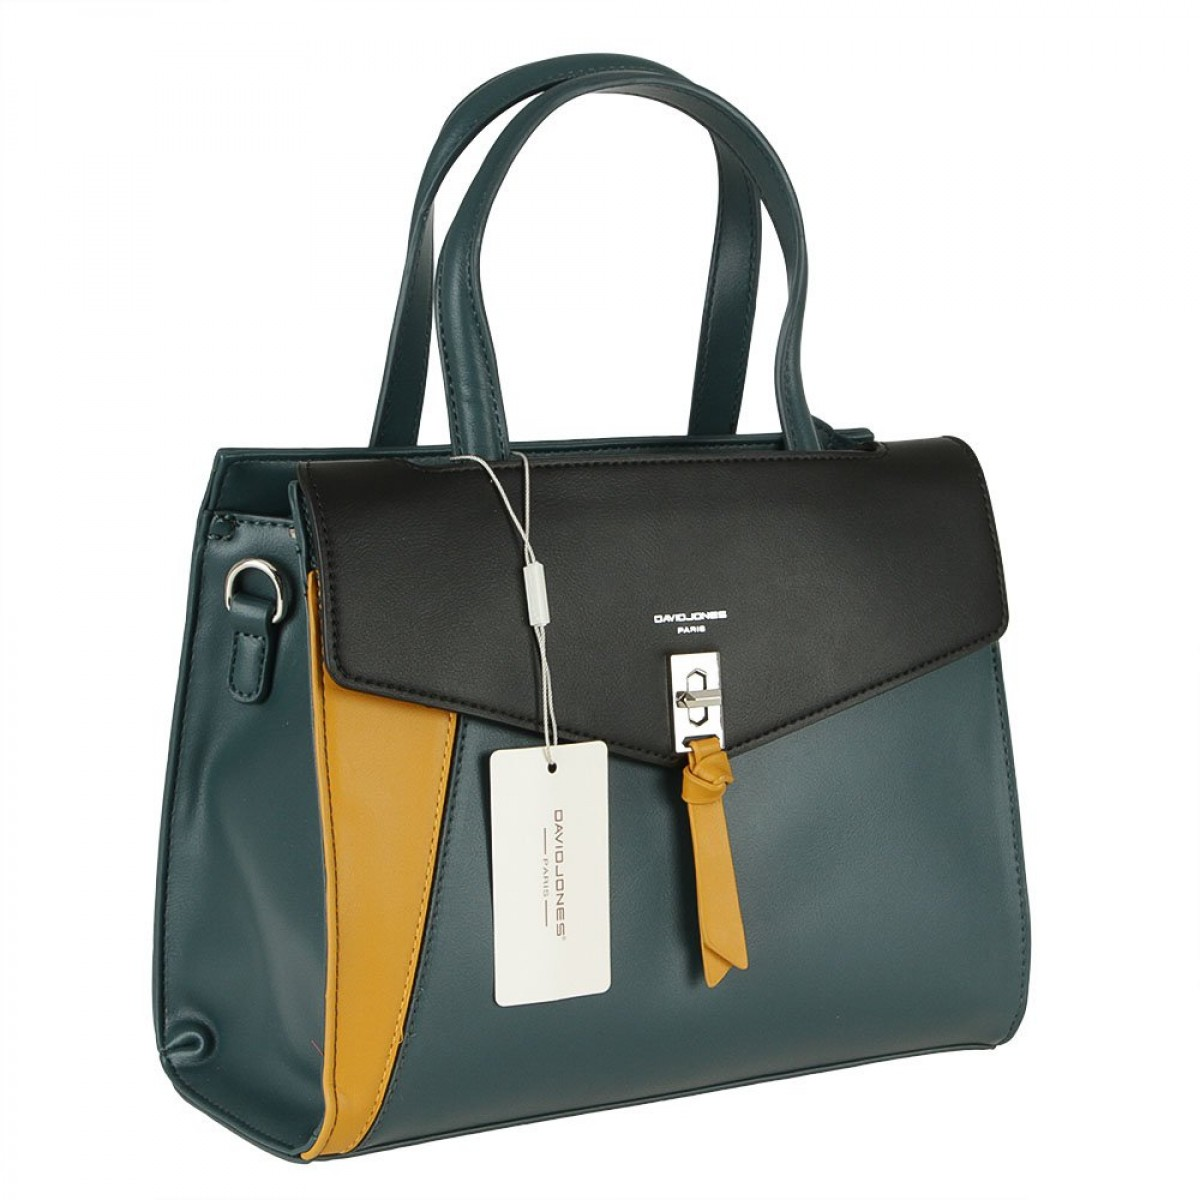 Жіноча сумка David Jones 6410-2 PEACOCK BLUE